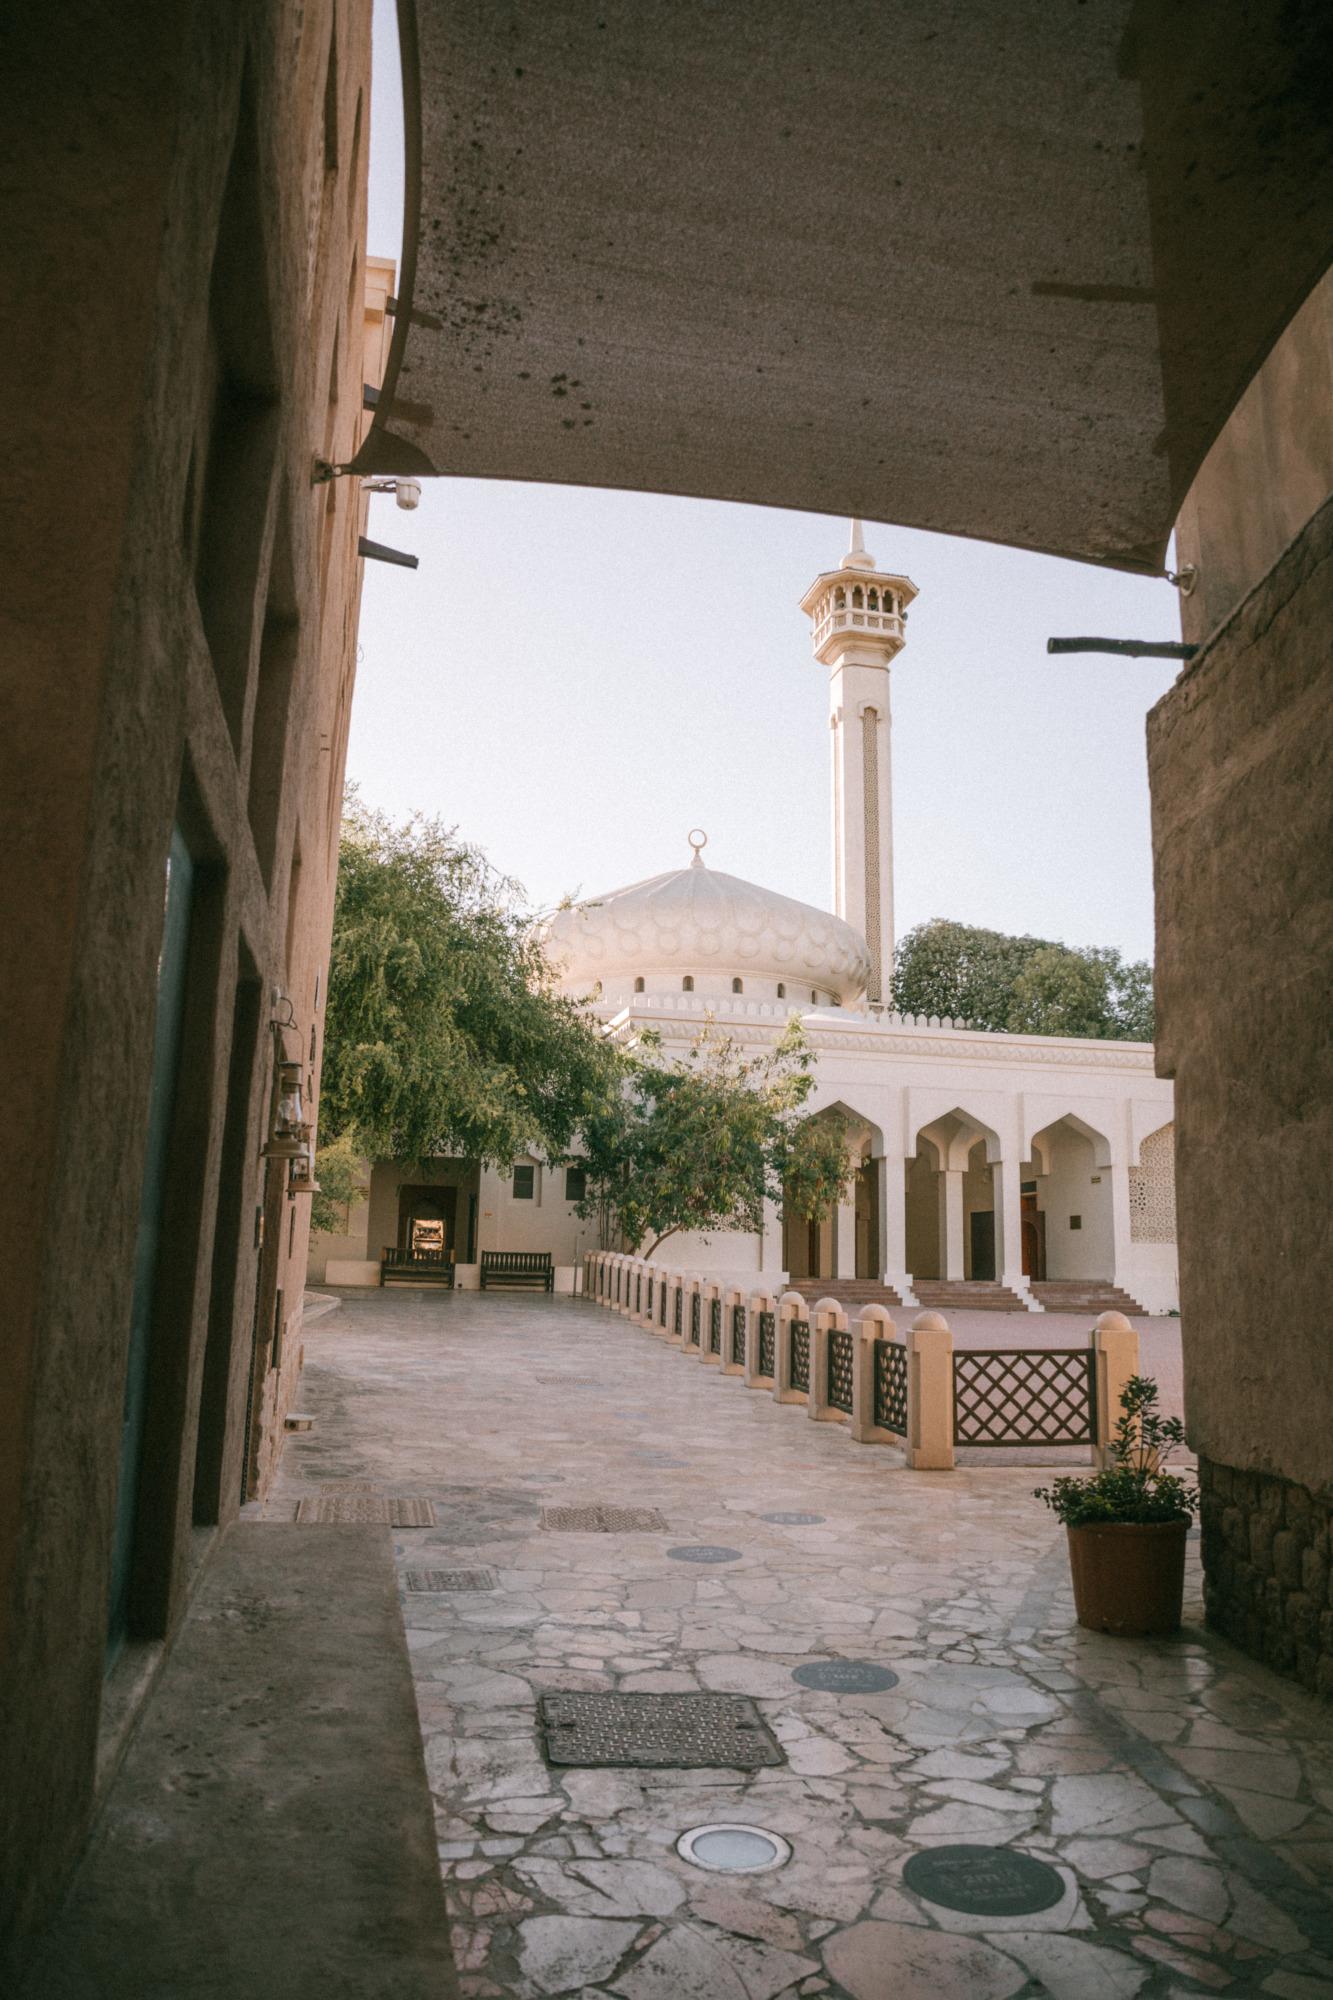 Al Fahidi Dubaï - Blondie Baby blog voyages